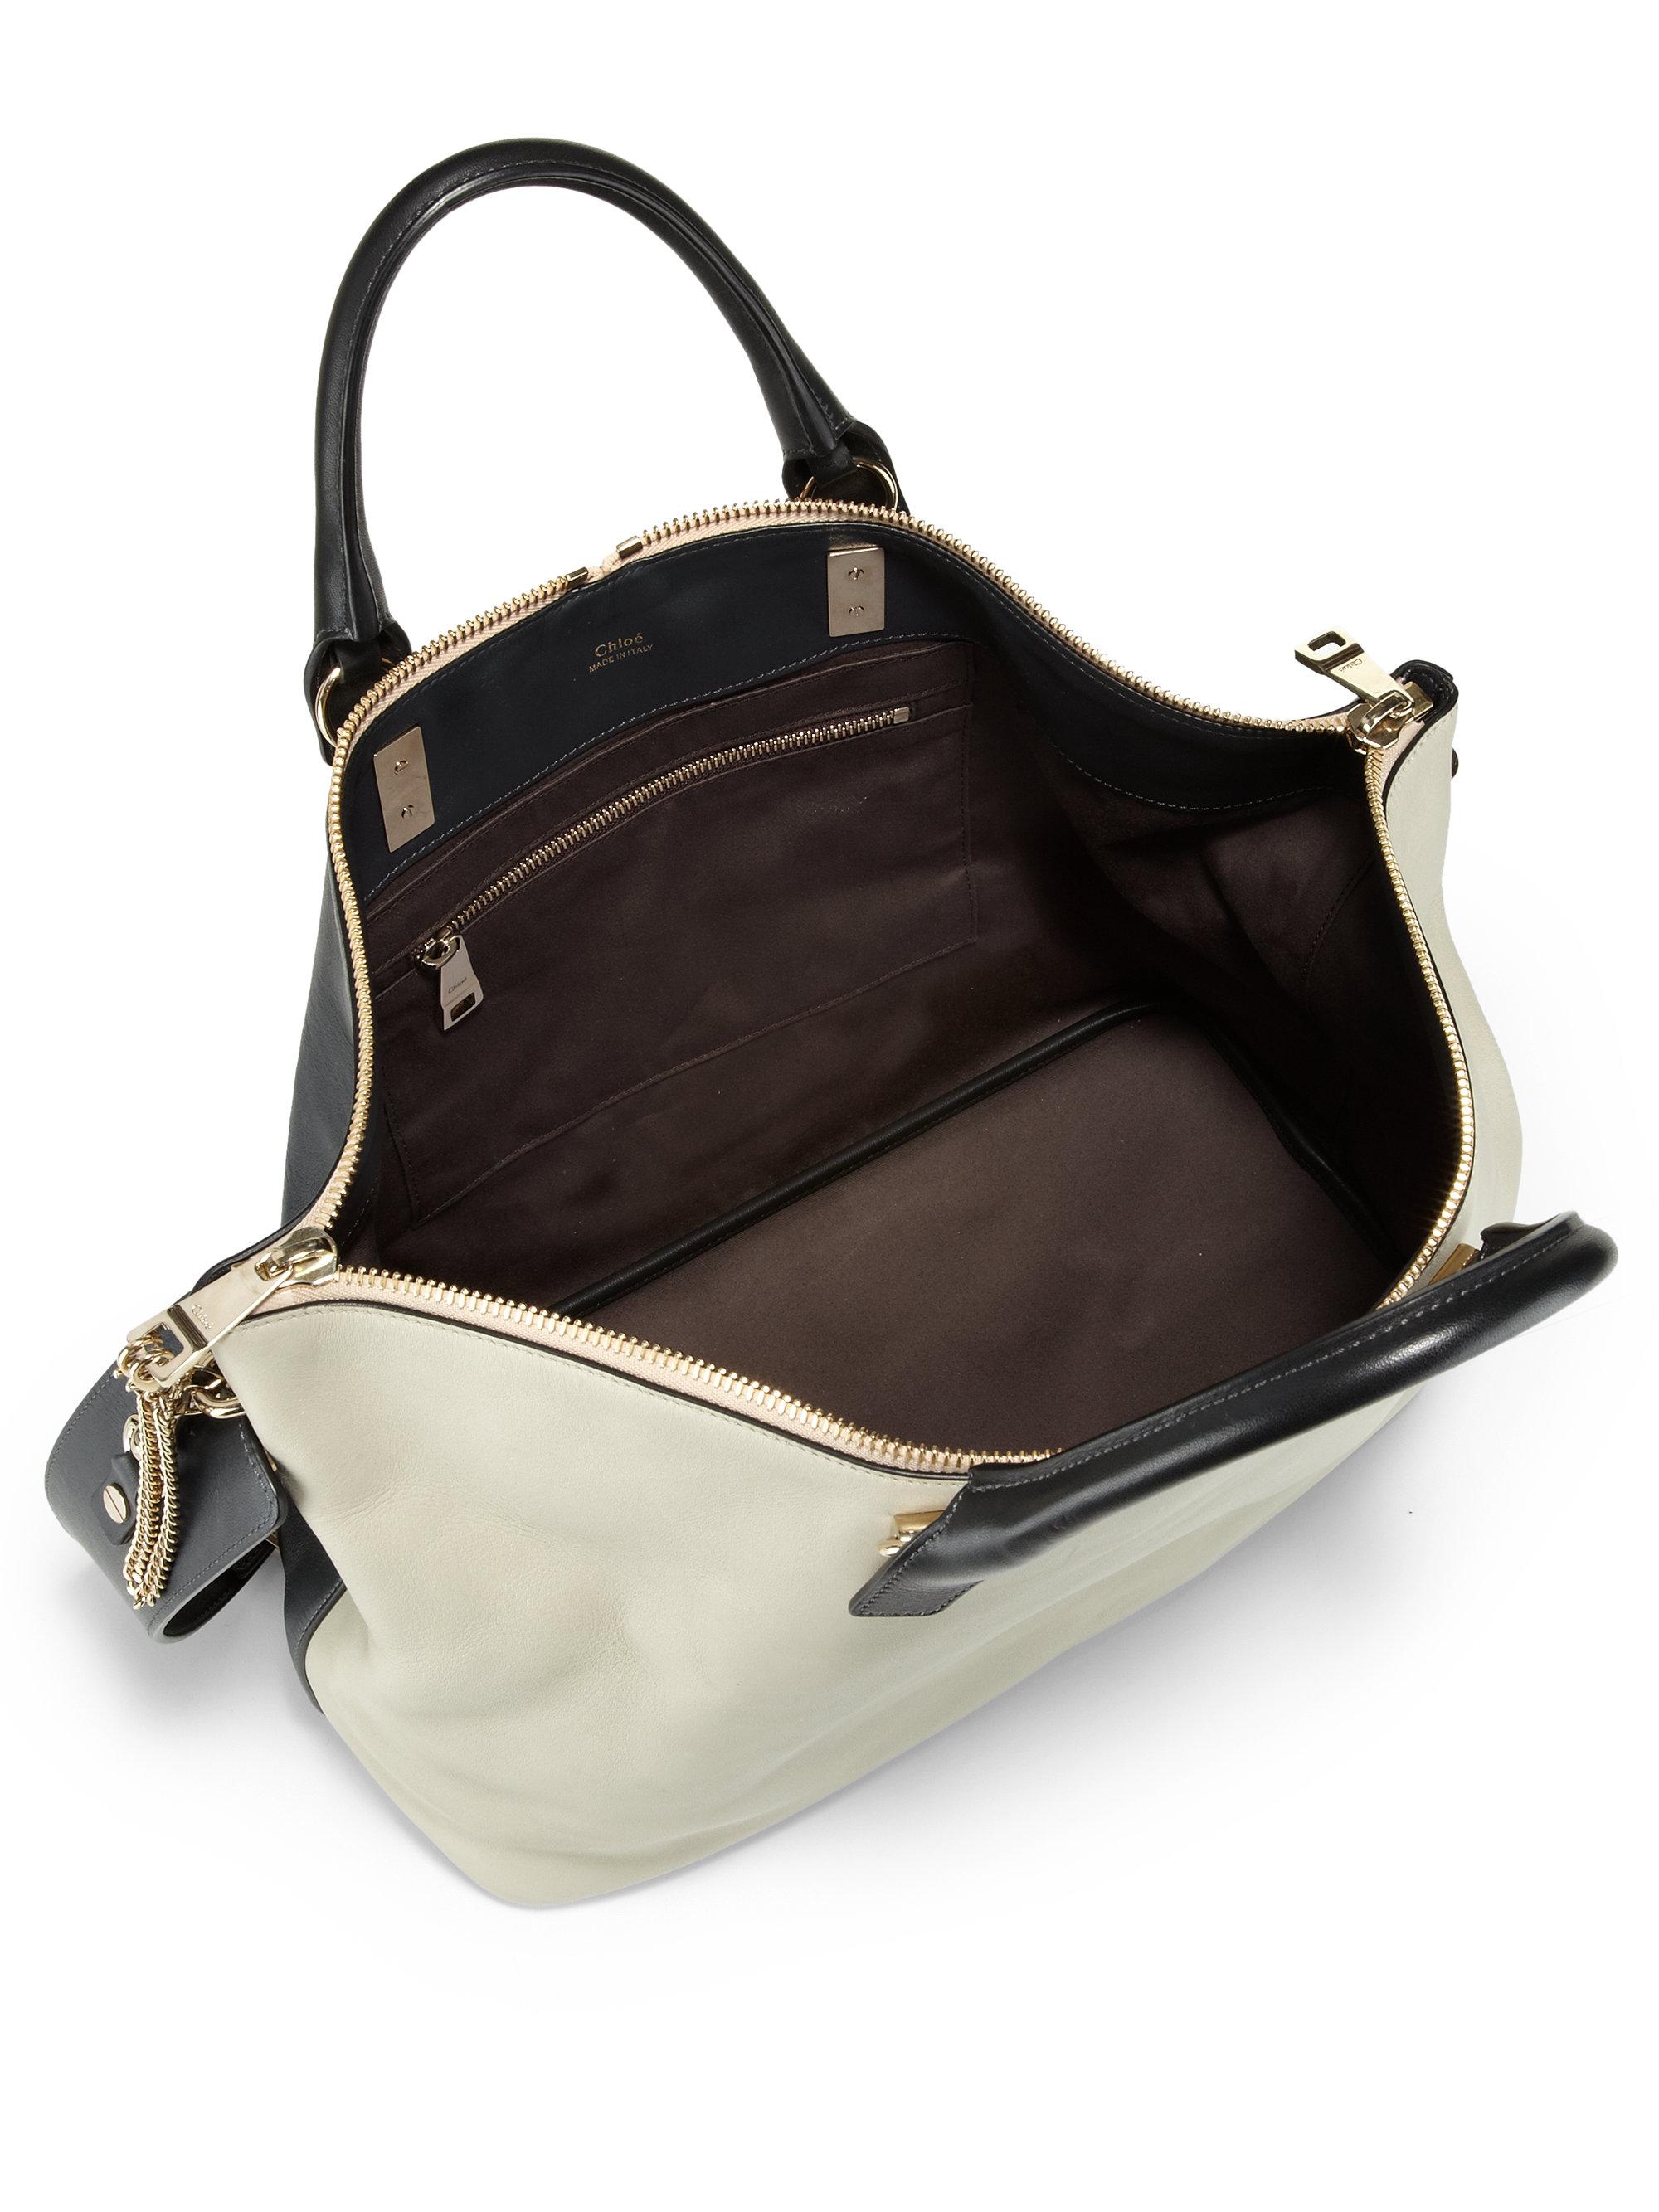 chloe bi-color small baylee bag